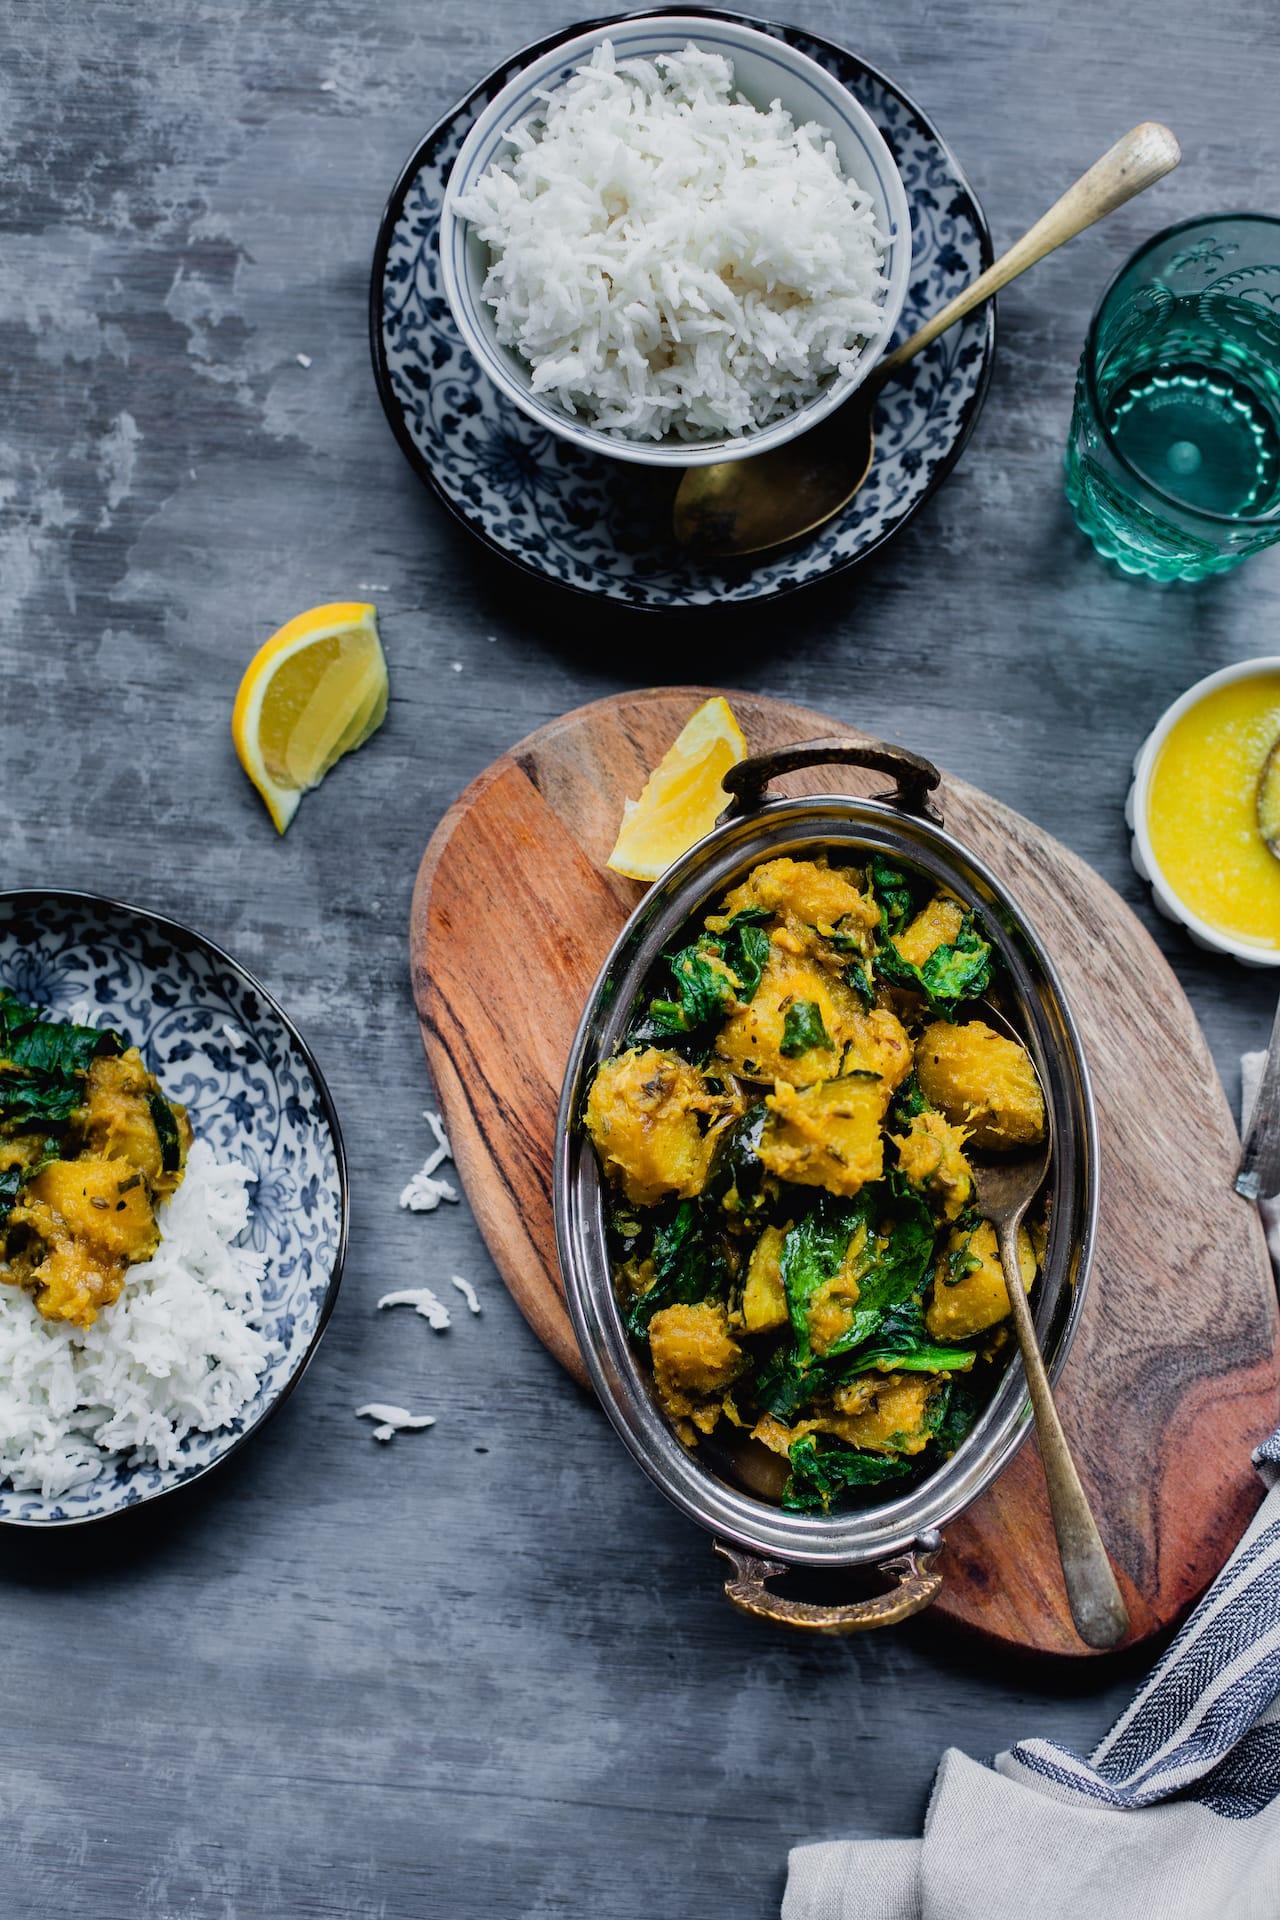 Kumro Palak (Acorn Squash And Spinach Stir Fry) 3